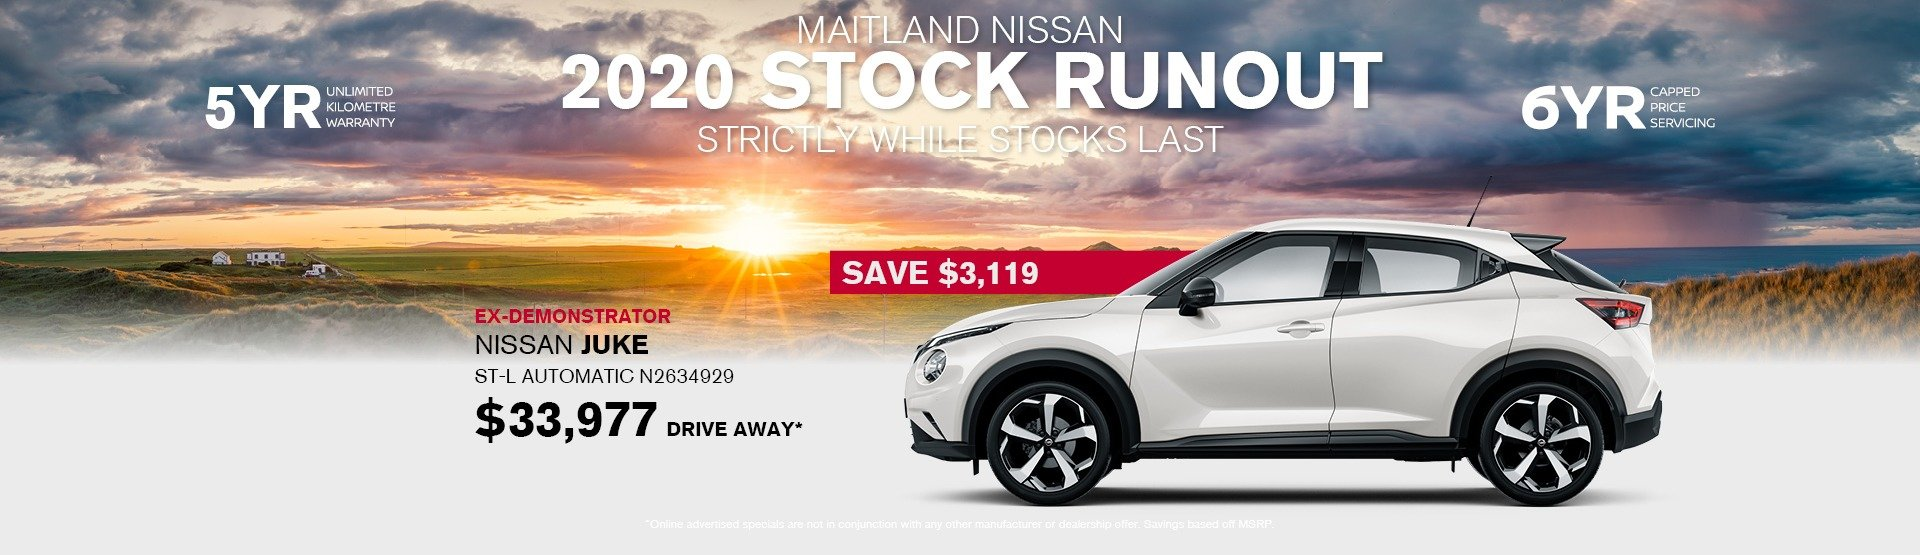 2020 Nissan Juke Special